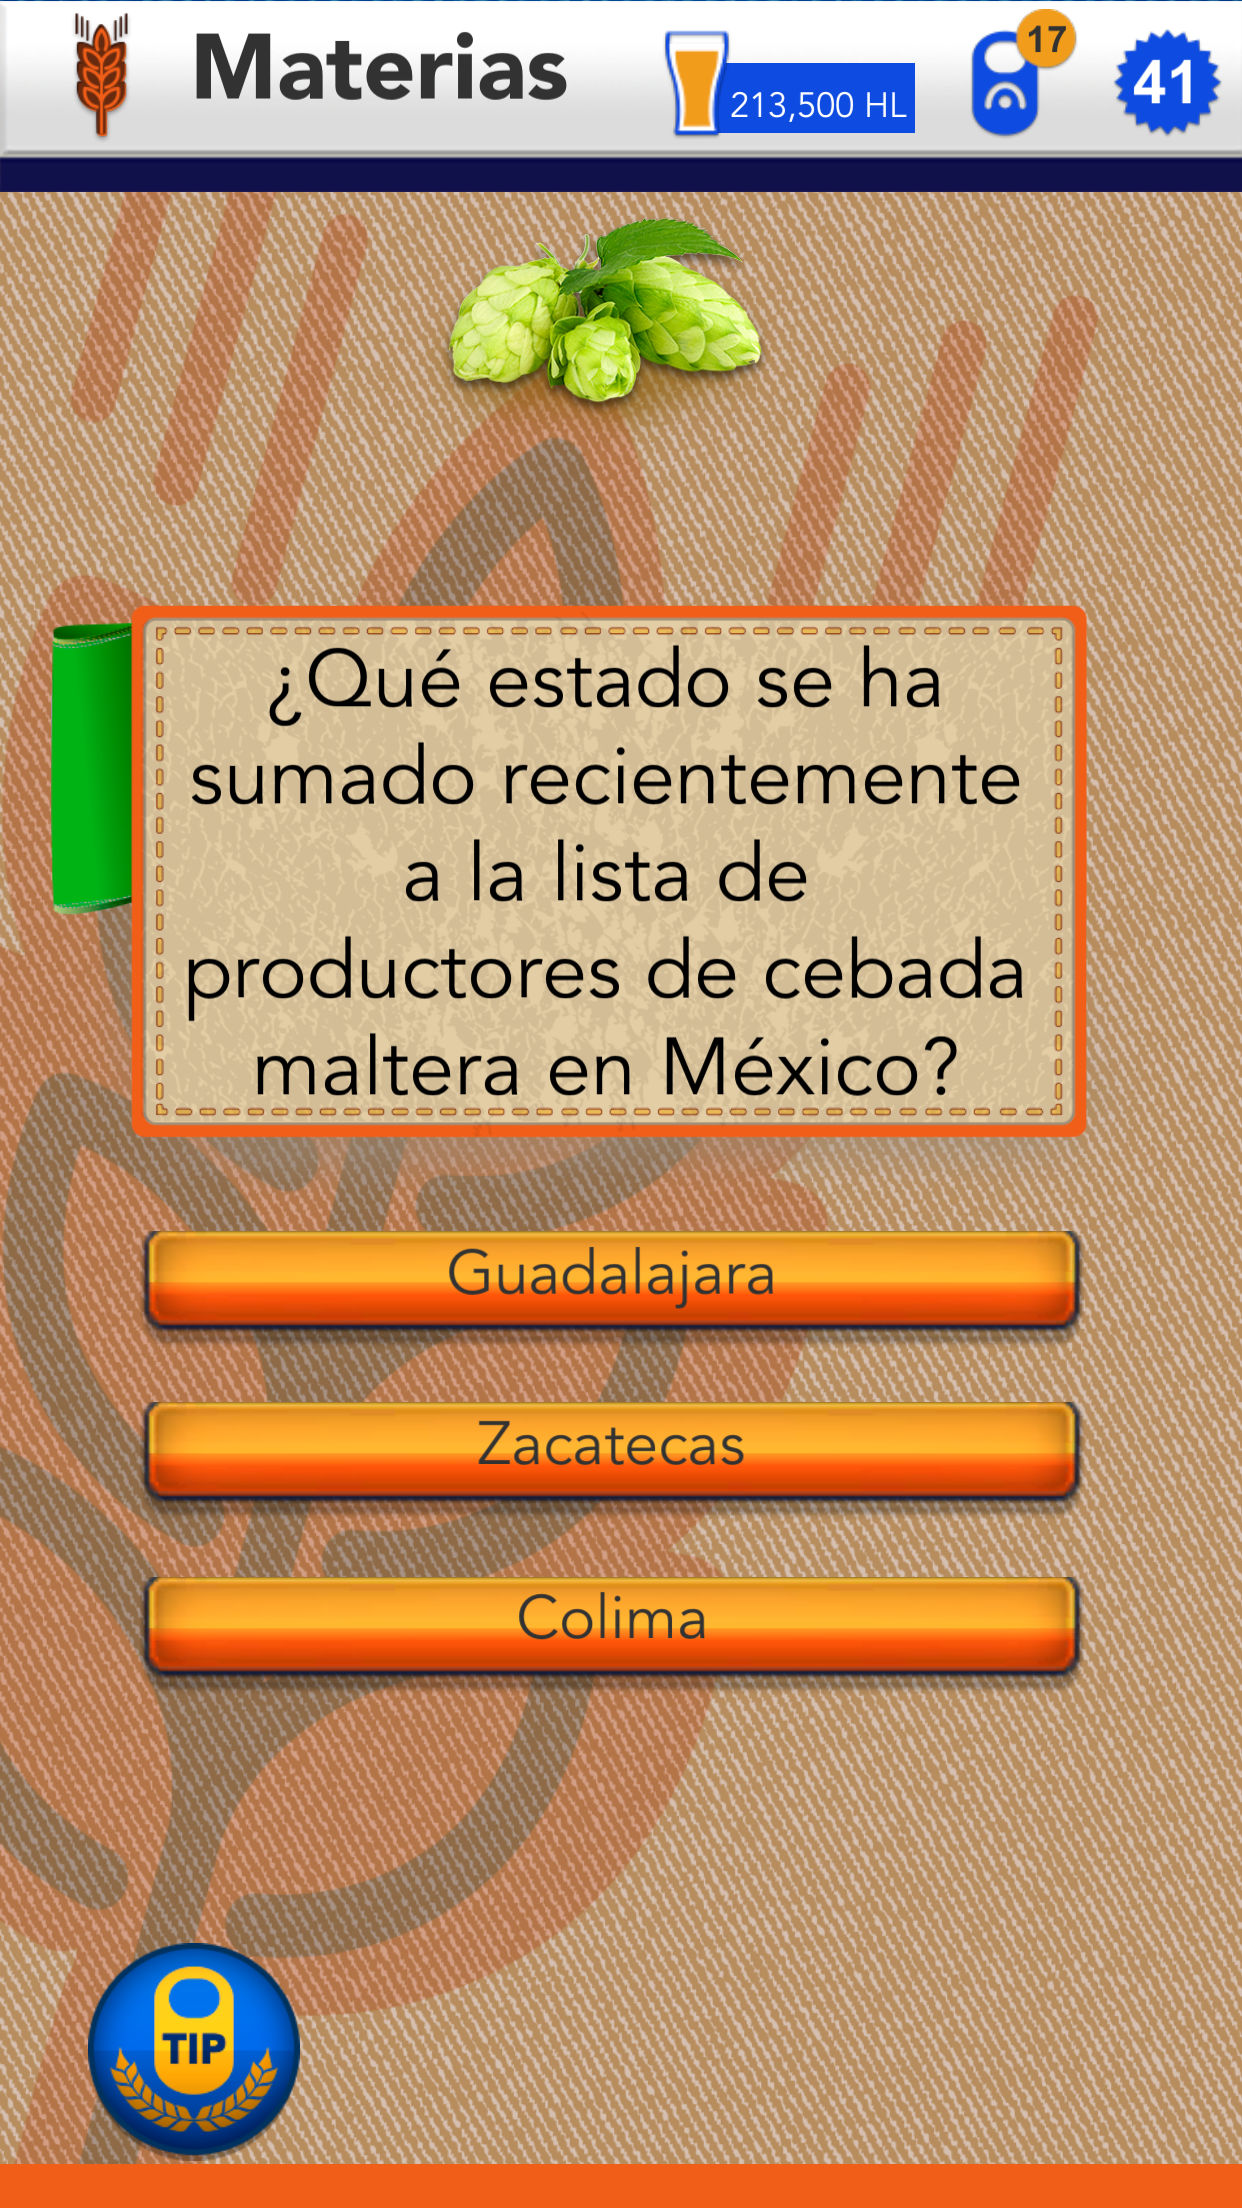 Quiz app about beer